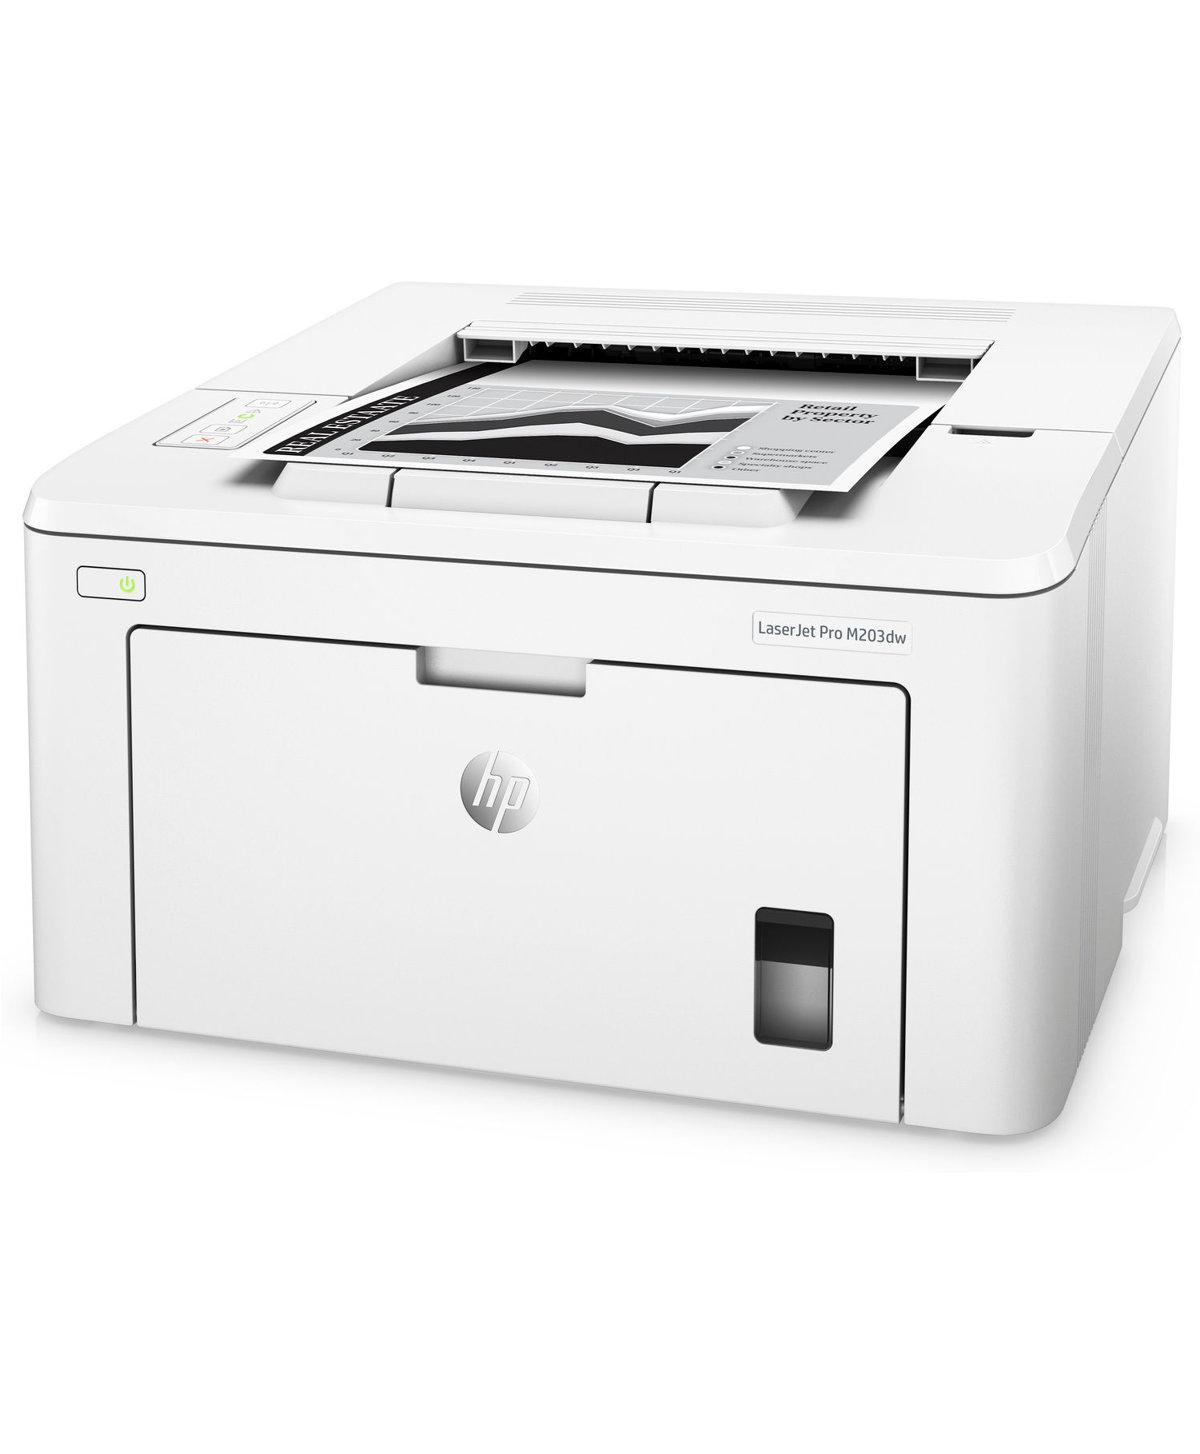 hasta 38 ppm Capacidad: 350 Hojas Laser Impresora 4800 x 600 dpi HP Laserjet Pro M402n Monocromo A4//Legal USB 2.